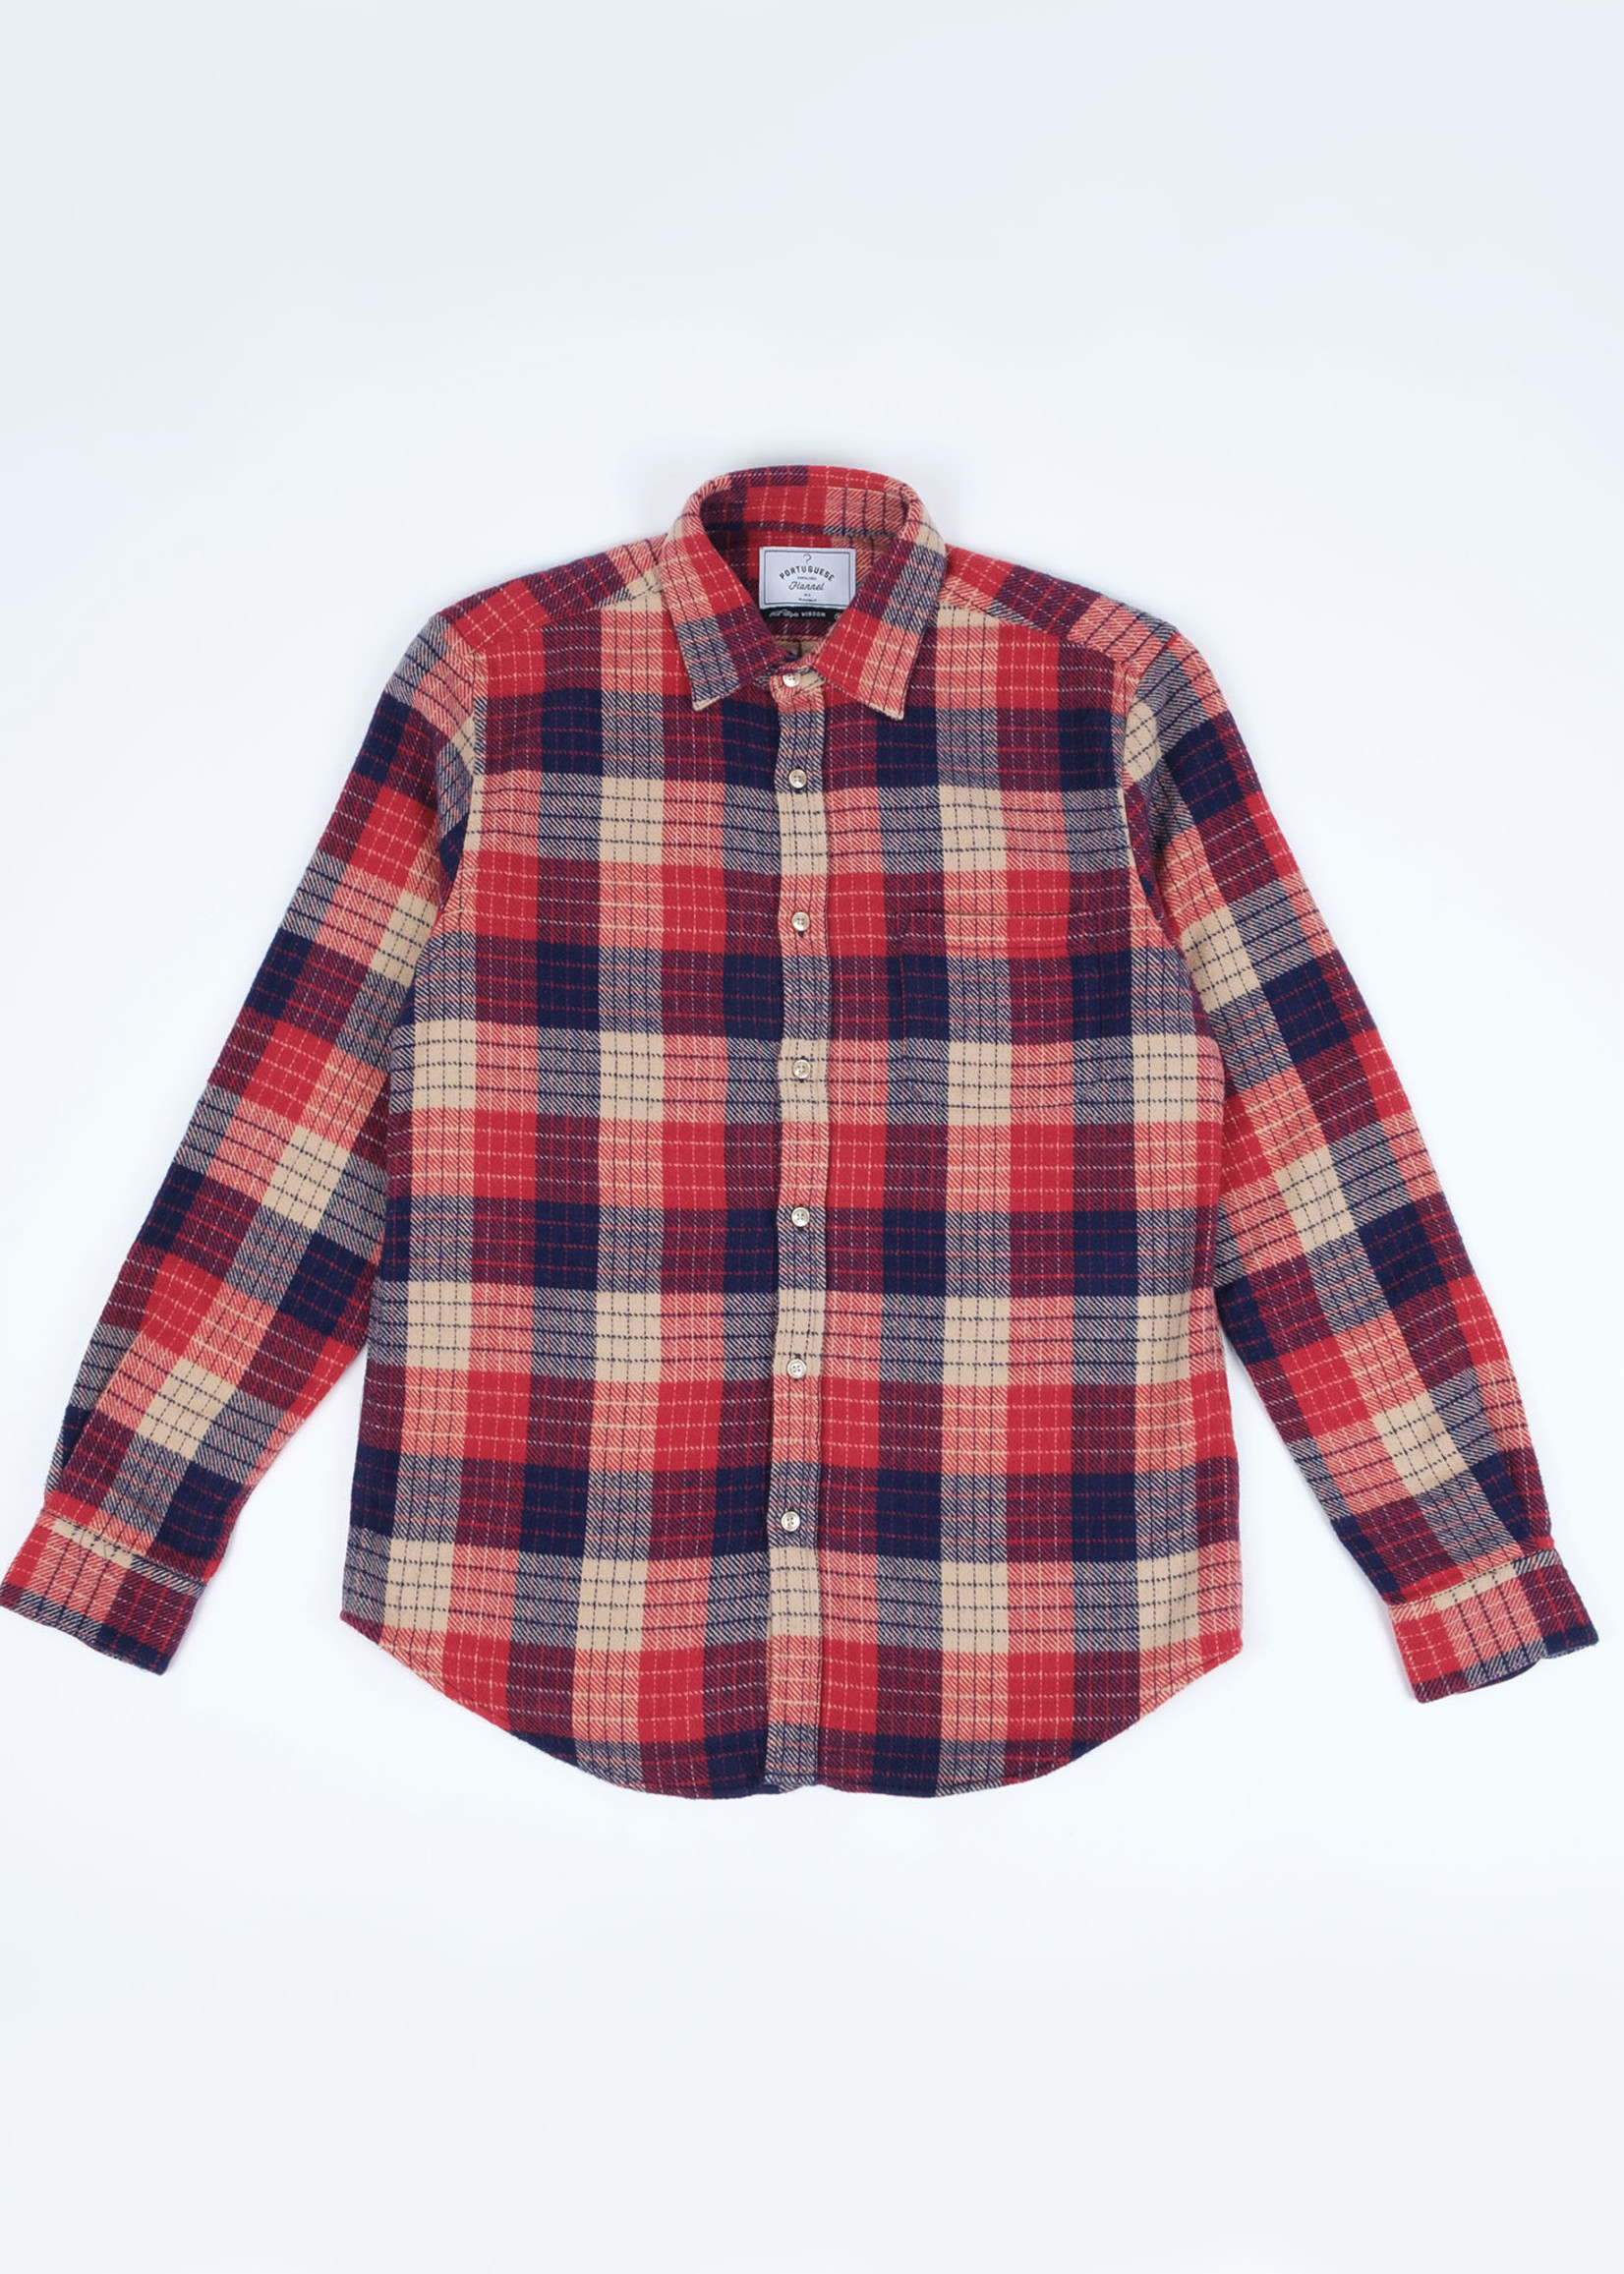 Portuguese Flannel Village Red Blue Plaid Sport Shirt by Portuguese Flannel